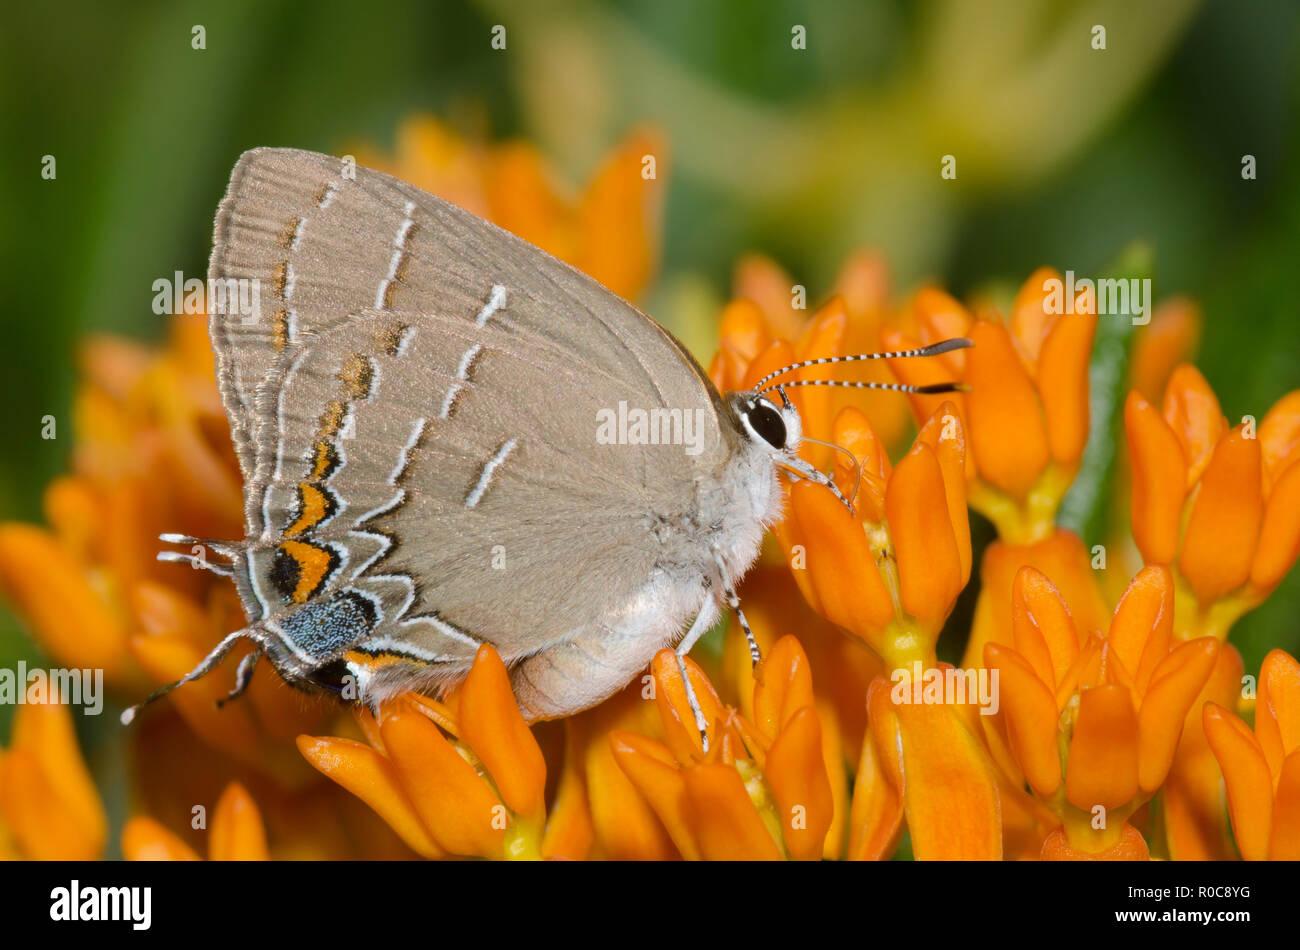 Soapberry Hairstreak, Phaeostrymon alcestis, nectaring from orange milkweed, Asclepias tuberosa - Stock Image